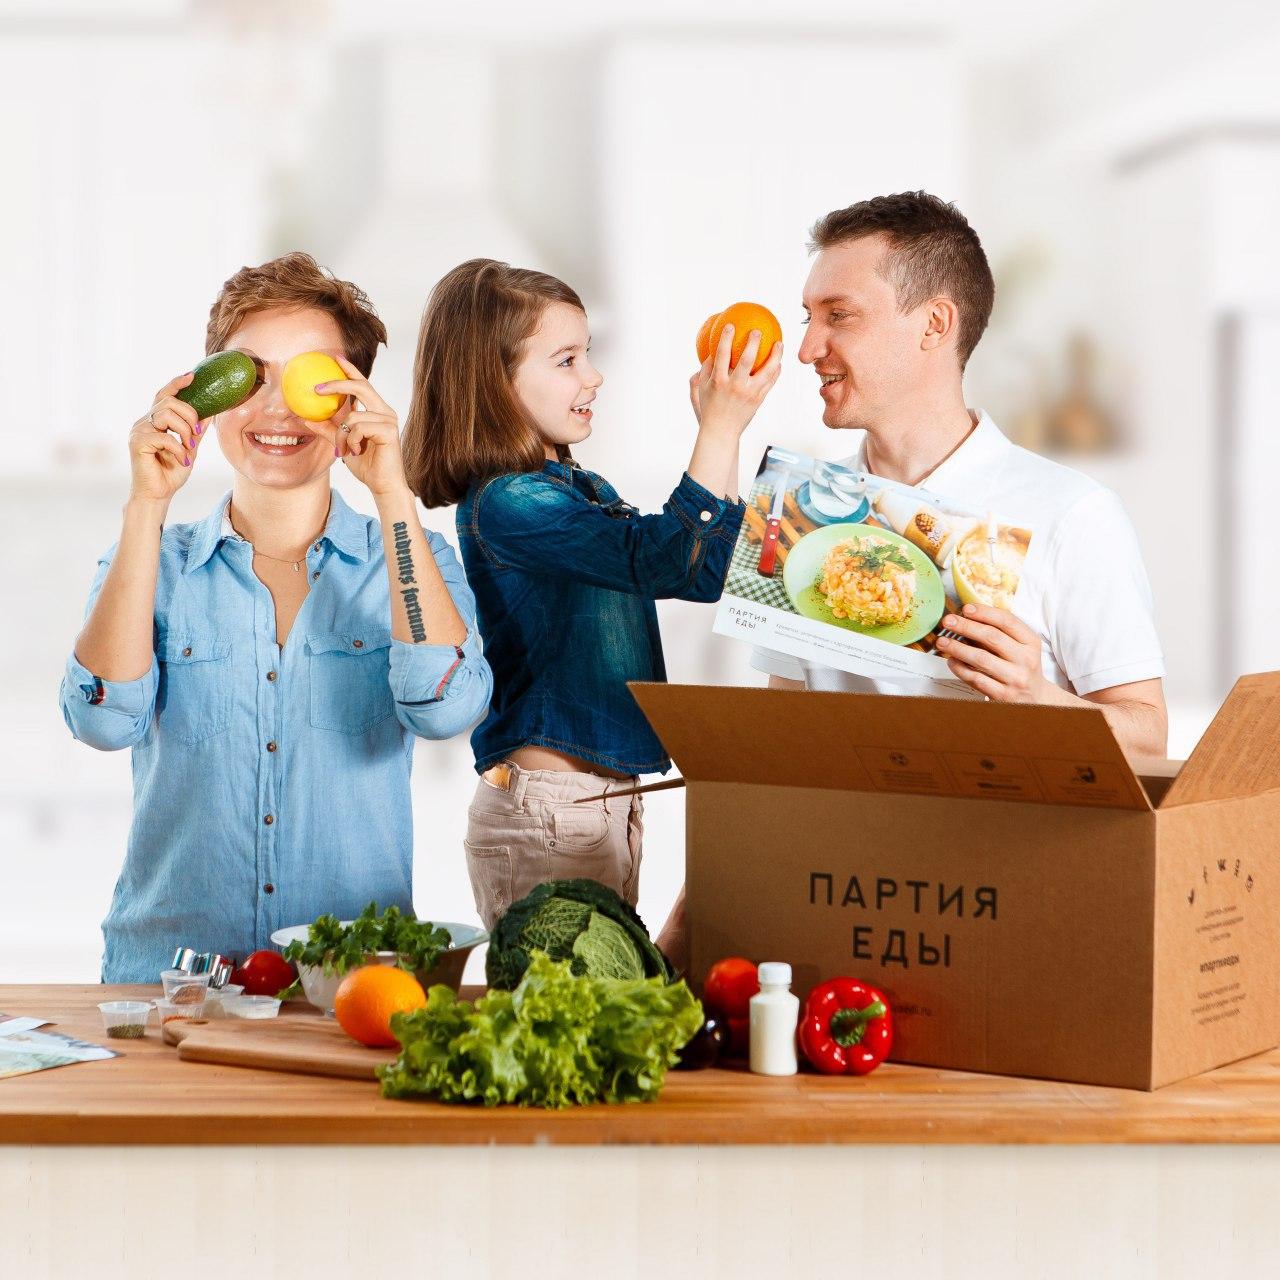 Balanced family menu: simple, fast, tasty